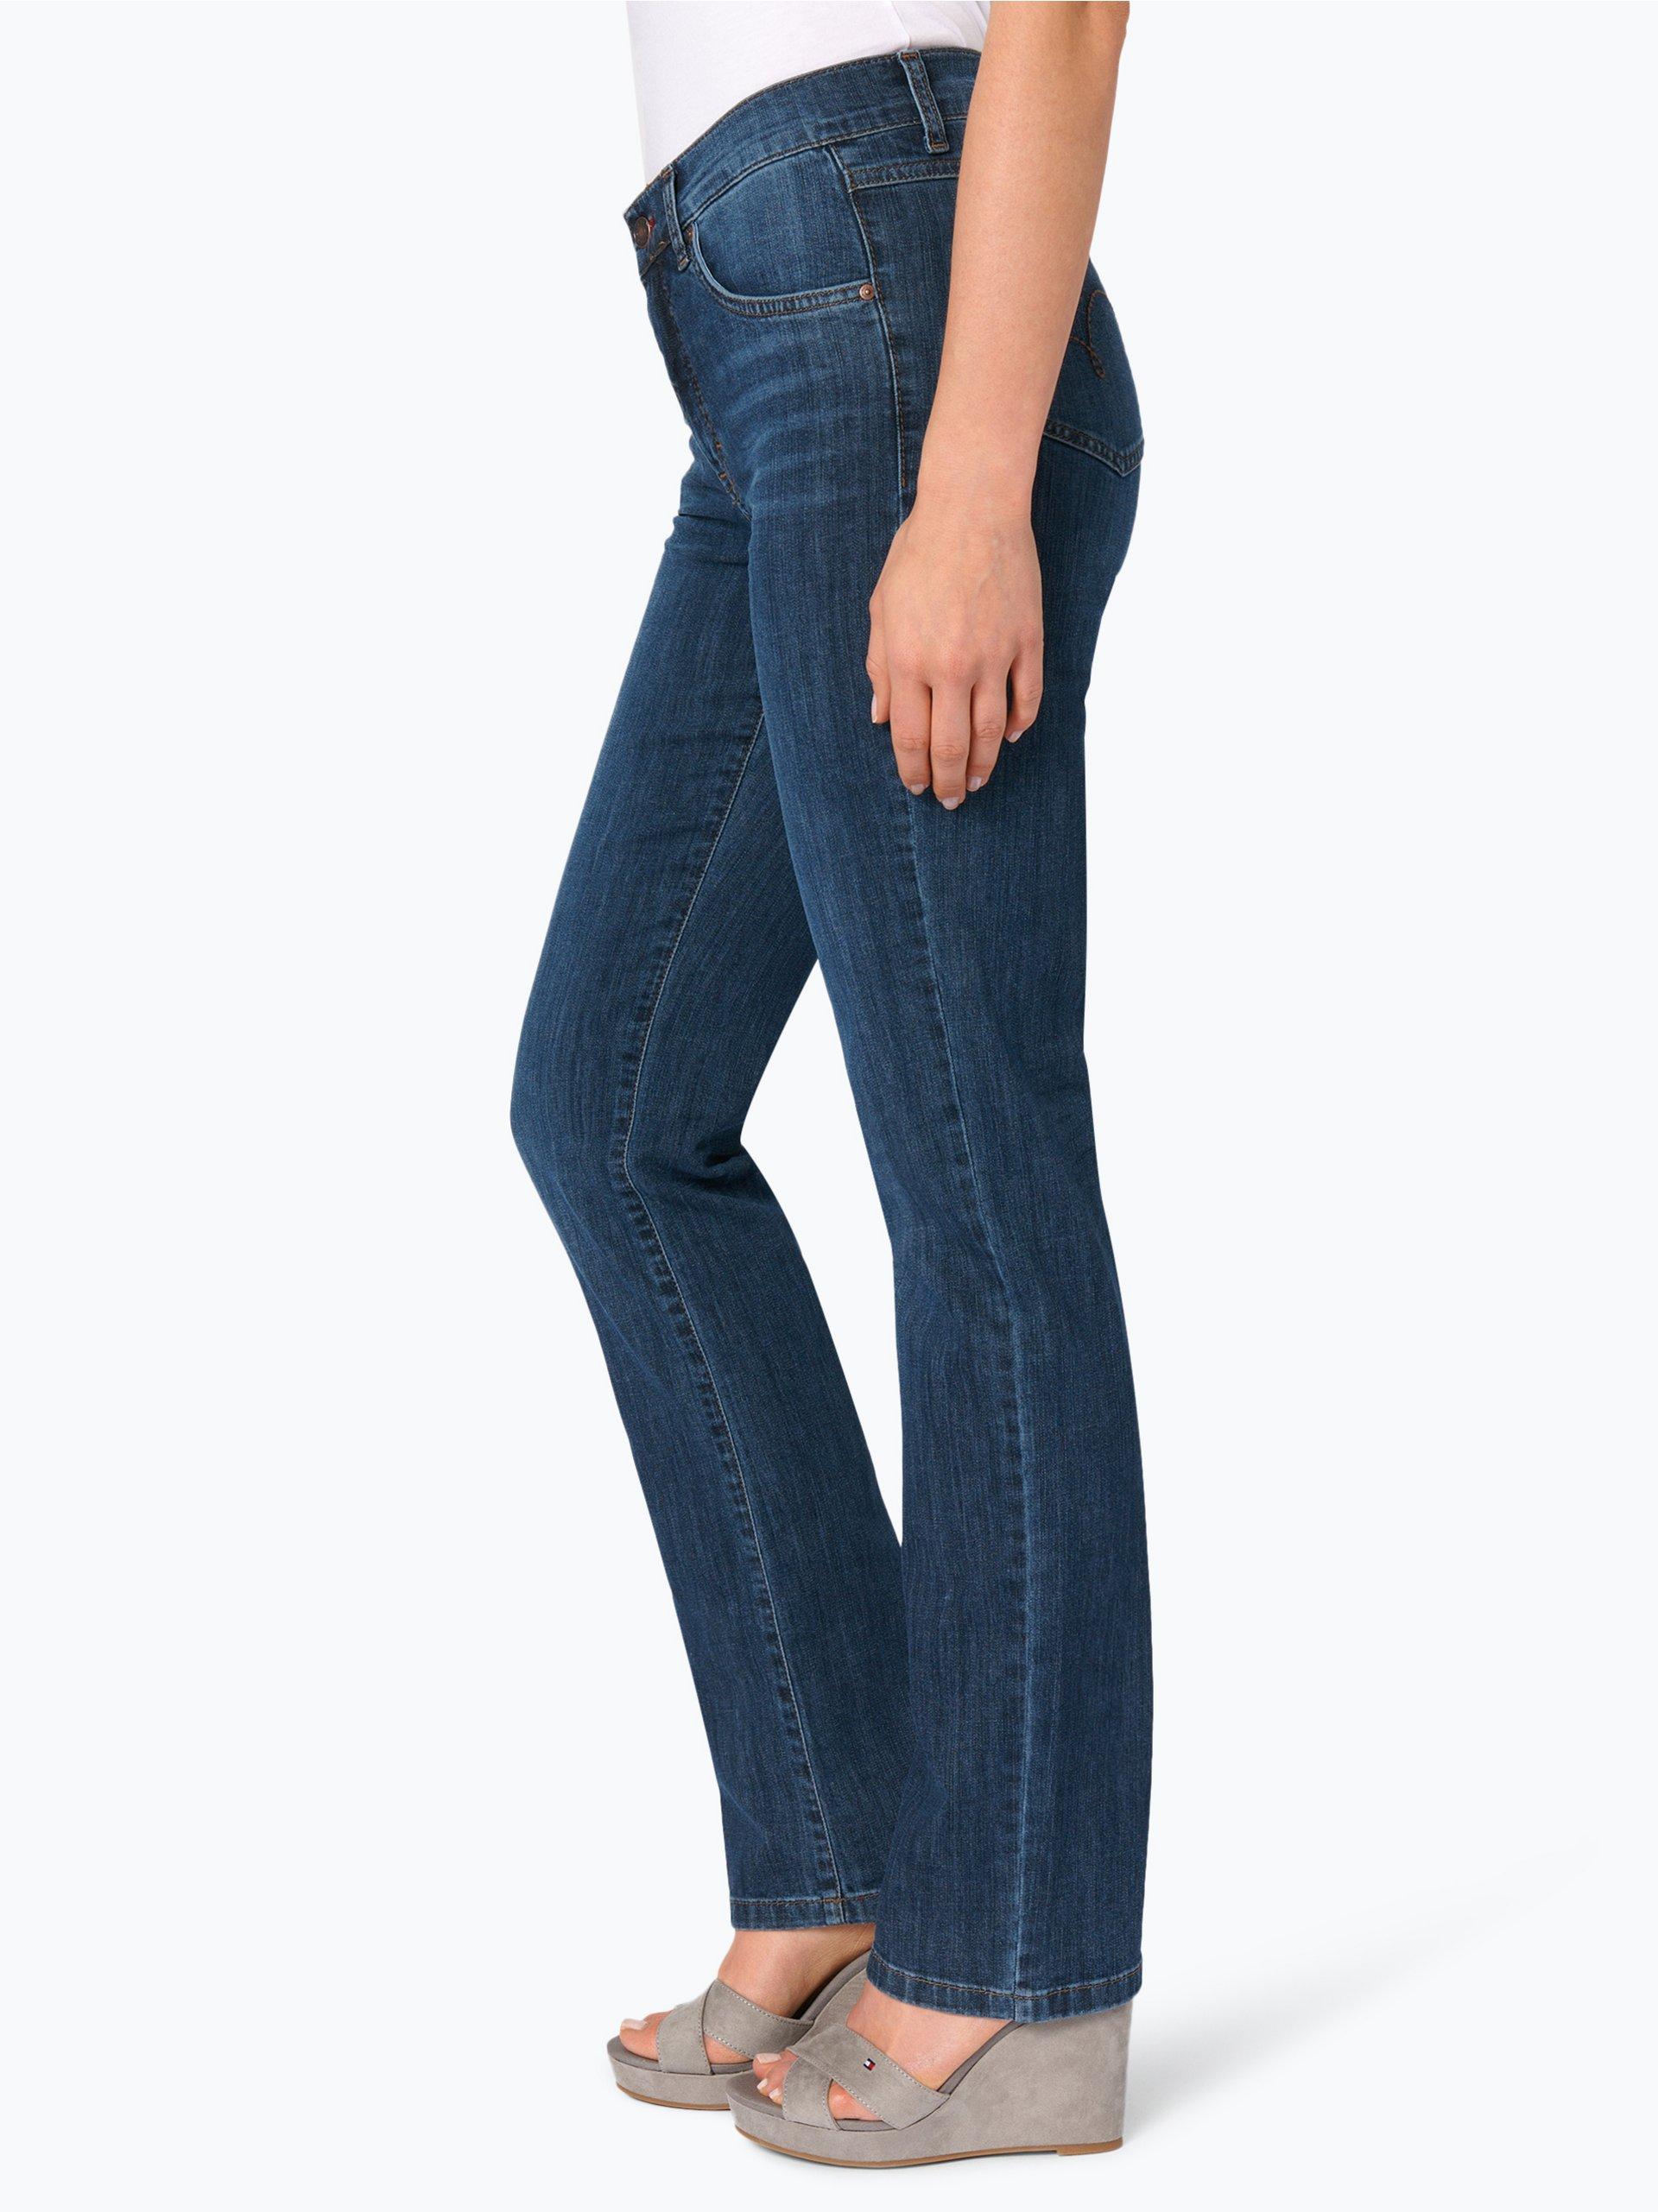 angels damen jeans dolly blue stone uni online kaufen. Black Bedroom Furniture Sets. Home Design Ideas